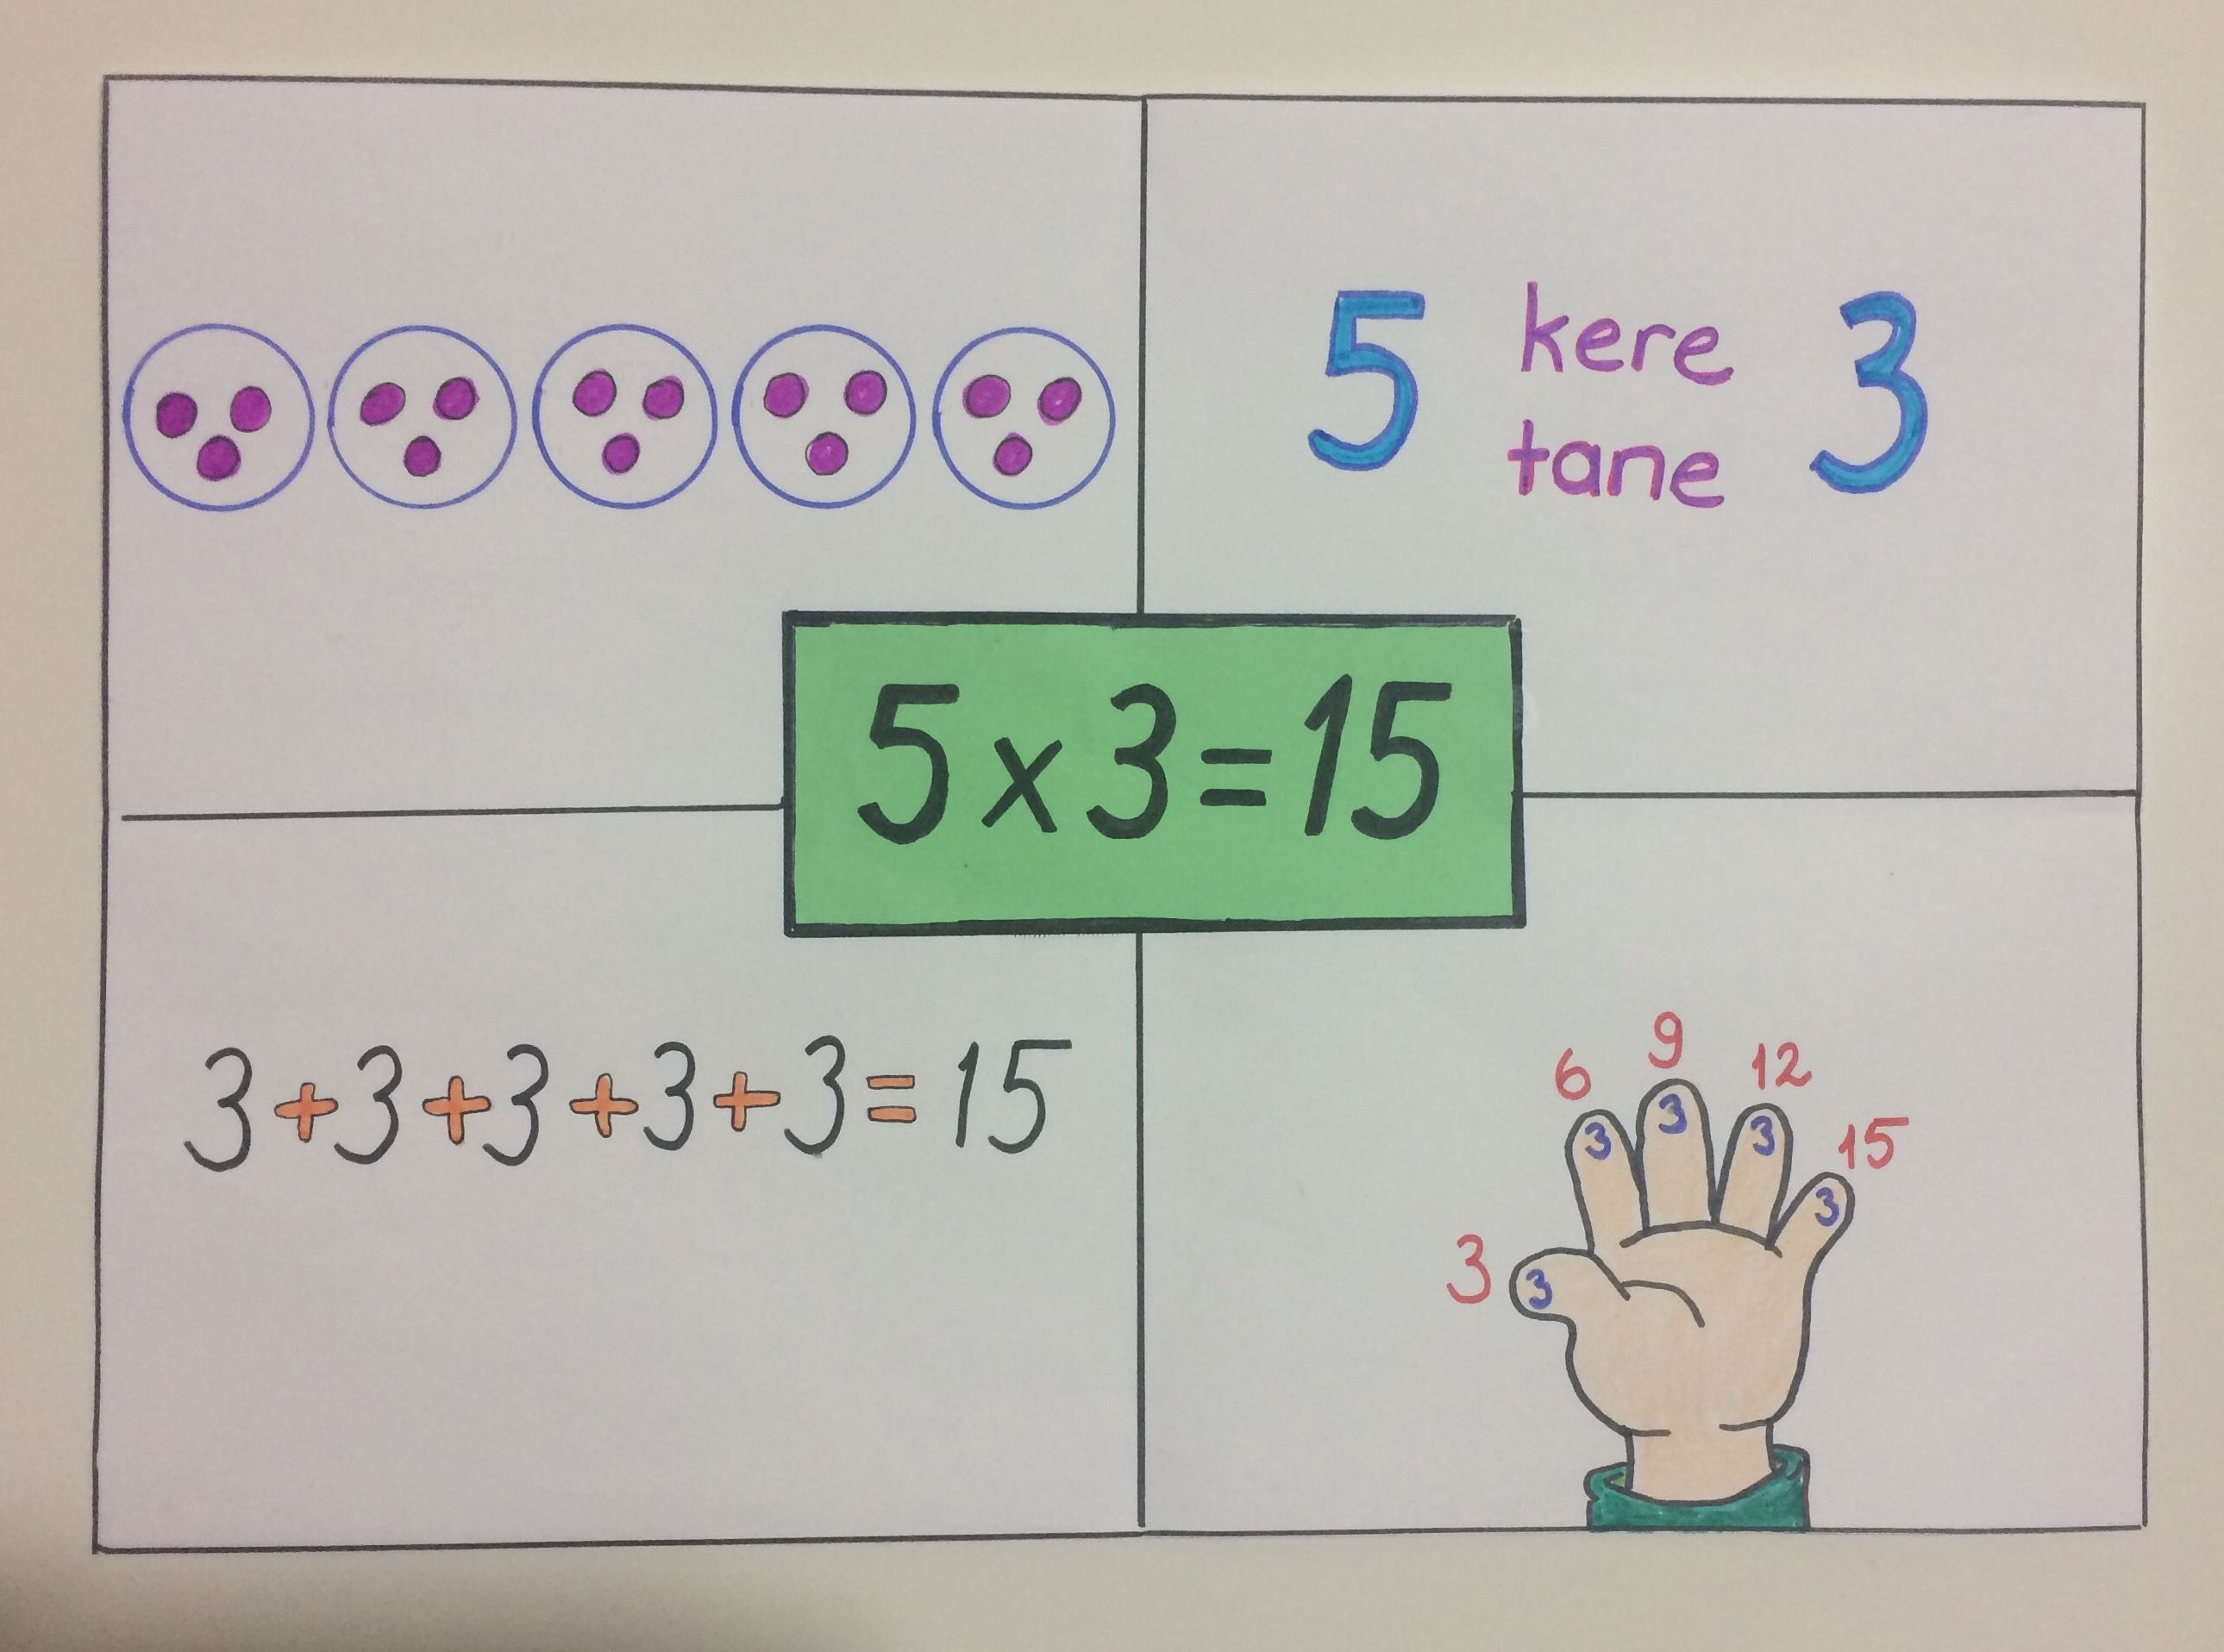 2 Sinif Carpma Islemi Carpma Temel Matematik 2 Sinif Matematik